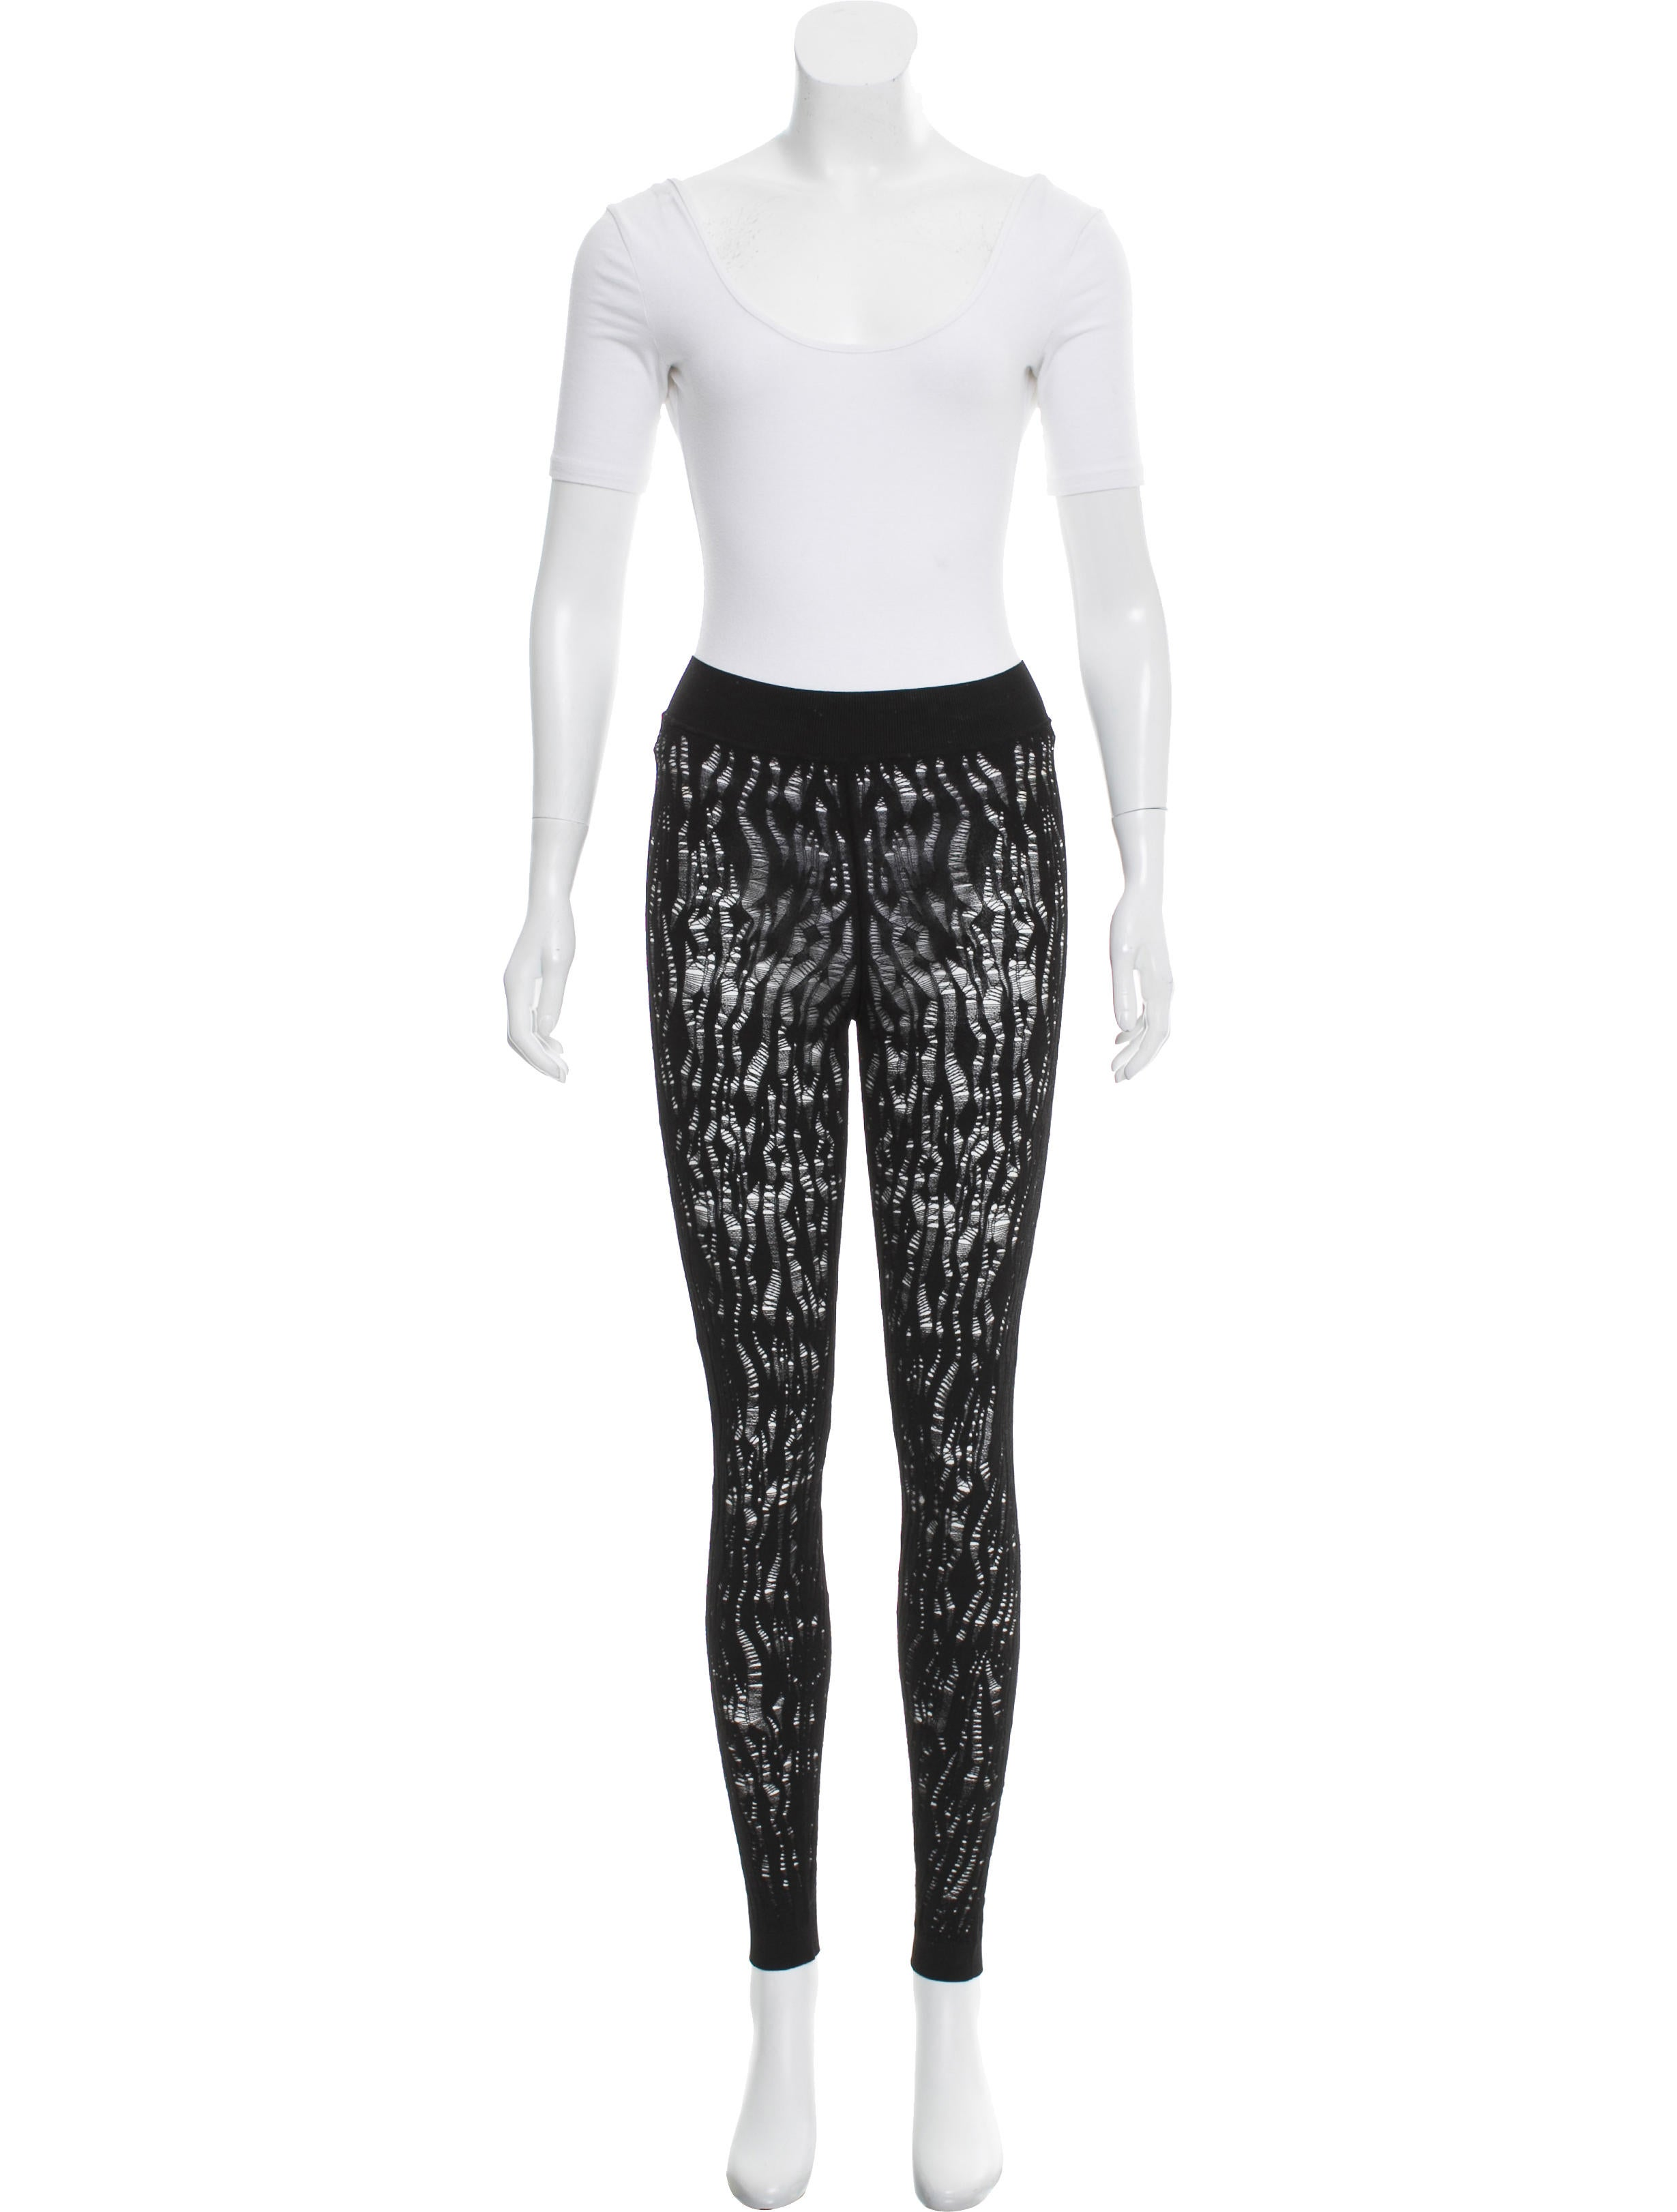 Louis Vuitton Semi-Sheer Cutout Pant Set - Clothing ...